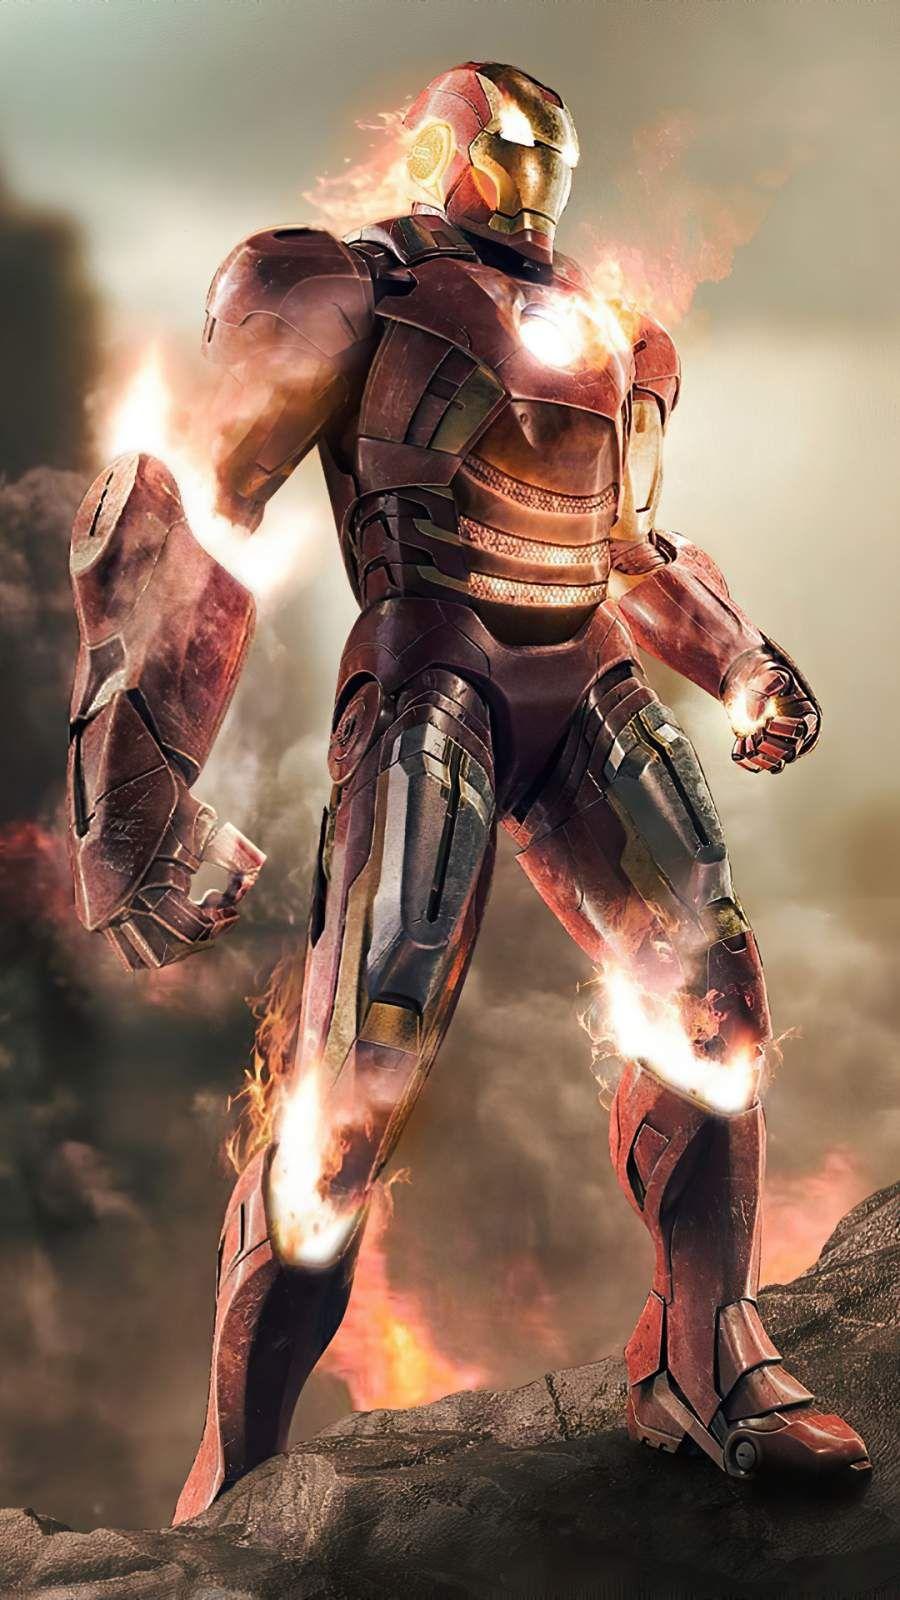 Iron Man Arc Reactor Avengers Endgame Iphone Wallpaper Iphone Wallpapers Iphone Wallpapers In 2021 Iron Man Hd Wallpaper Iron Man Wallpaper Iron Man Art Iphone ultra hd avengers endgame iron